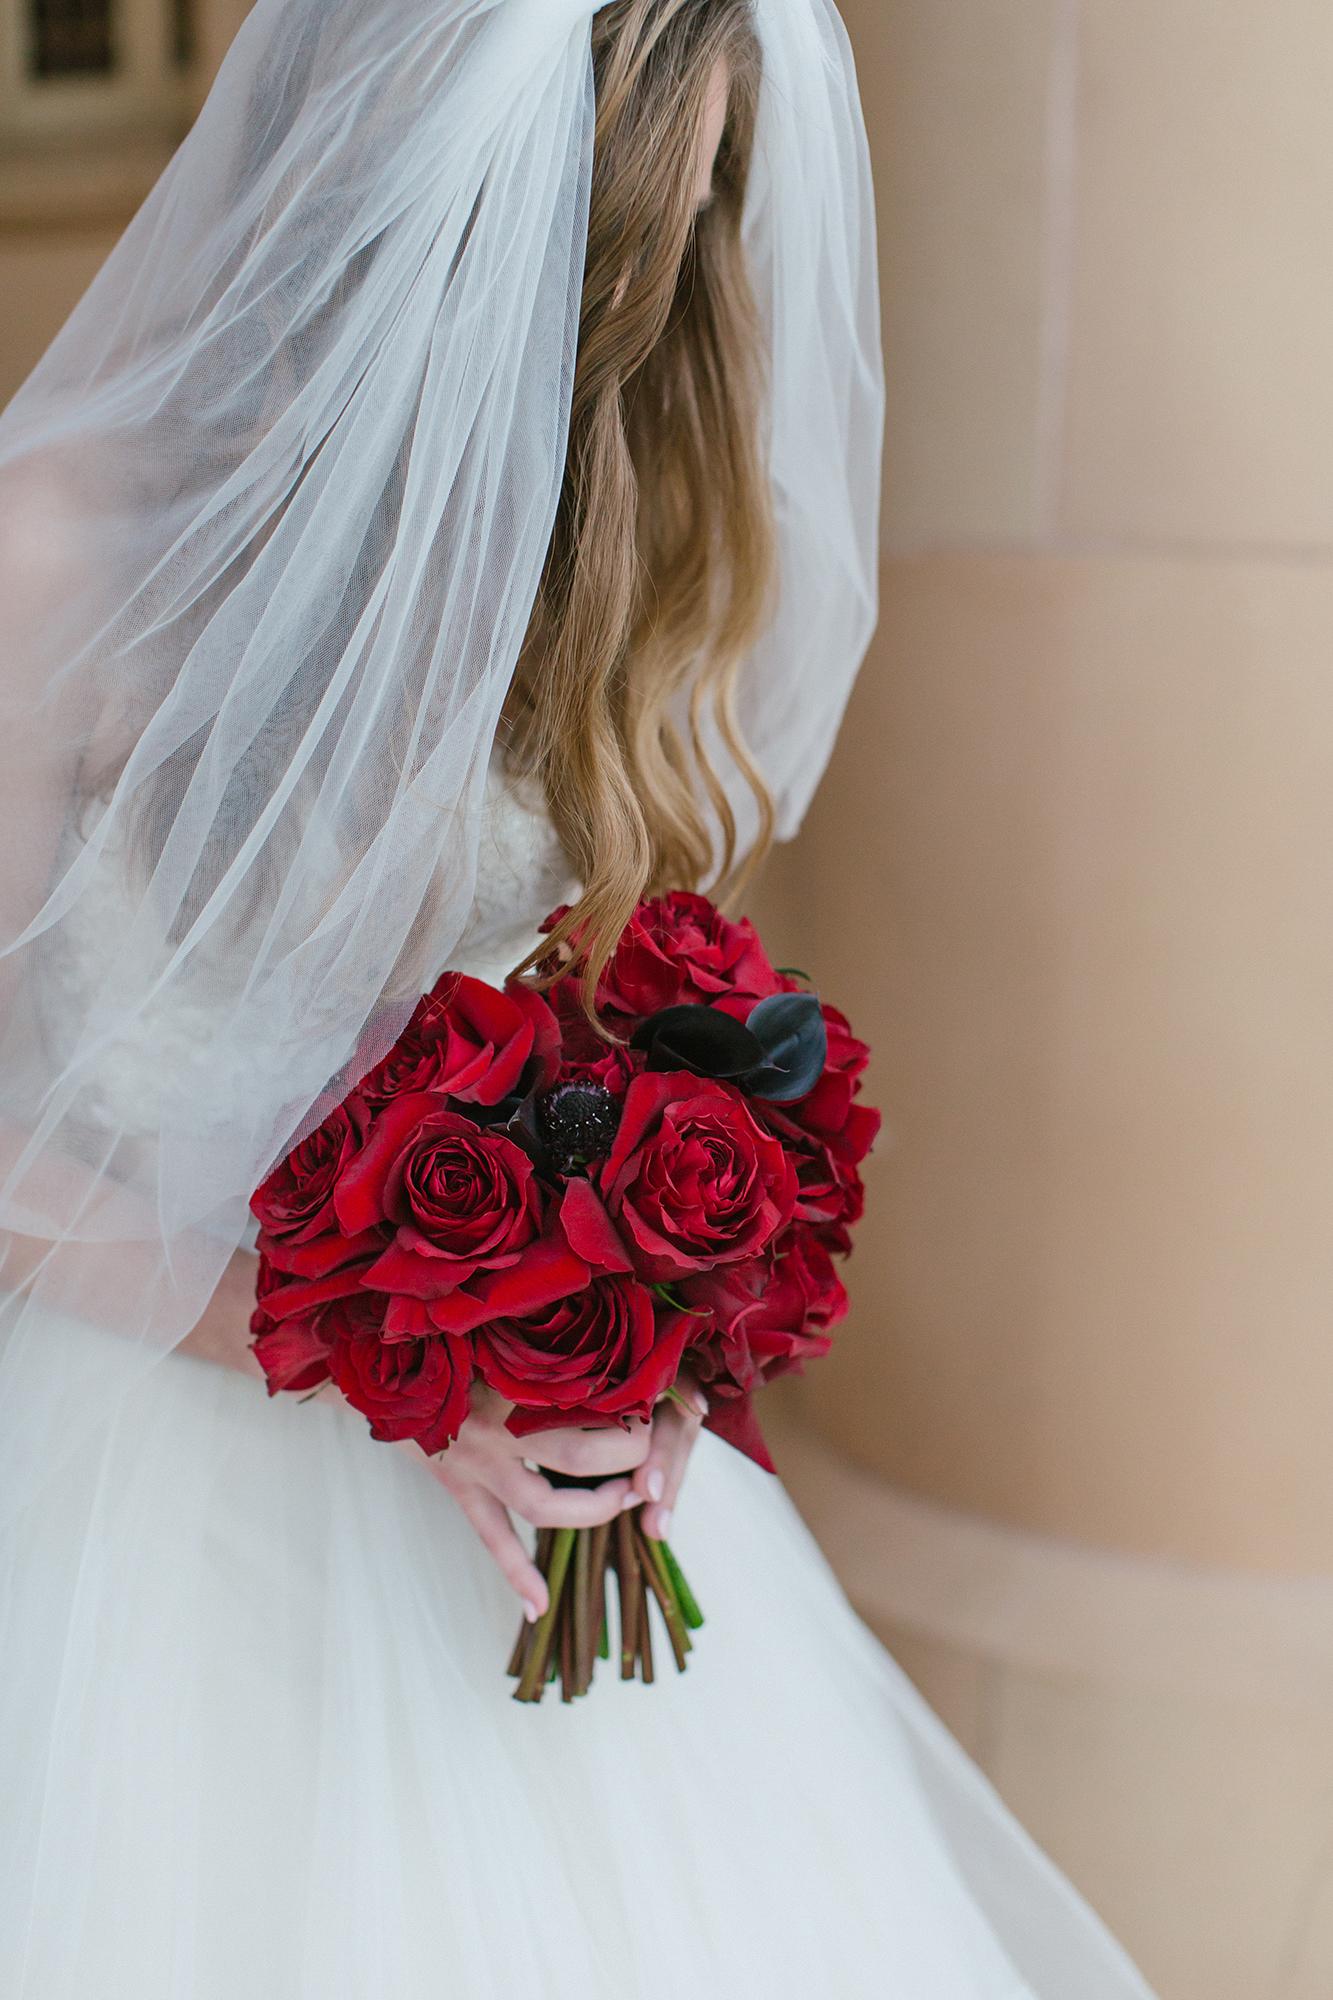 duff goldman johnna colbry brides bouquet red roses